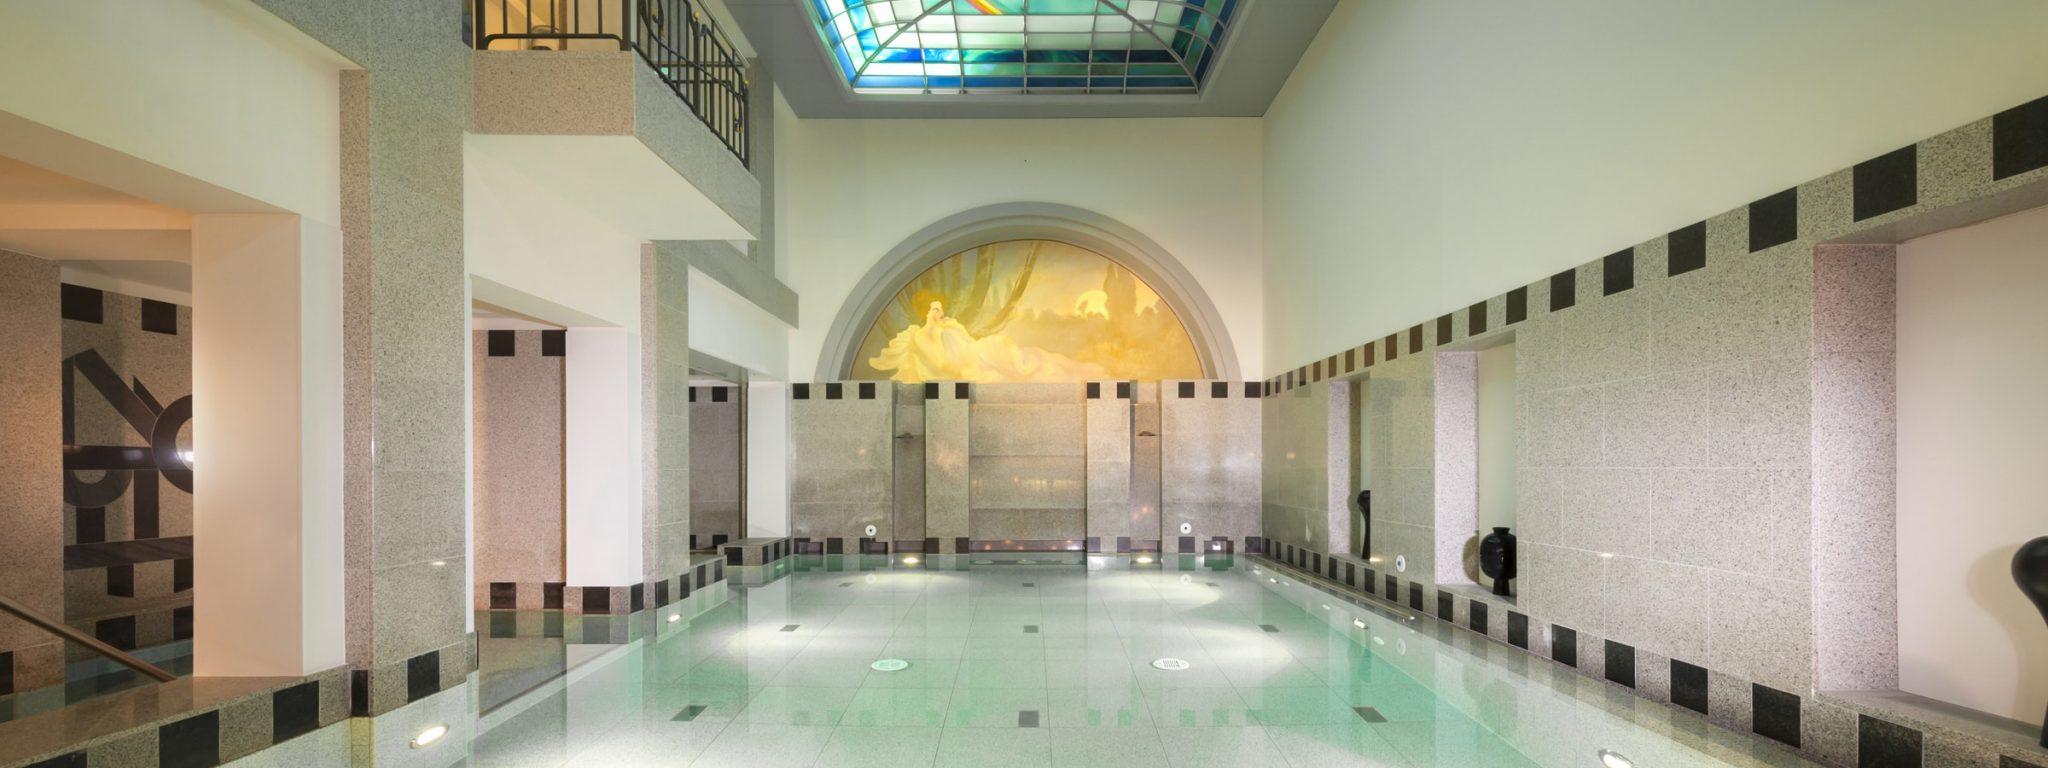 bad baden baden